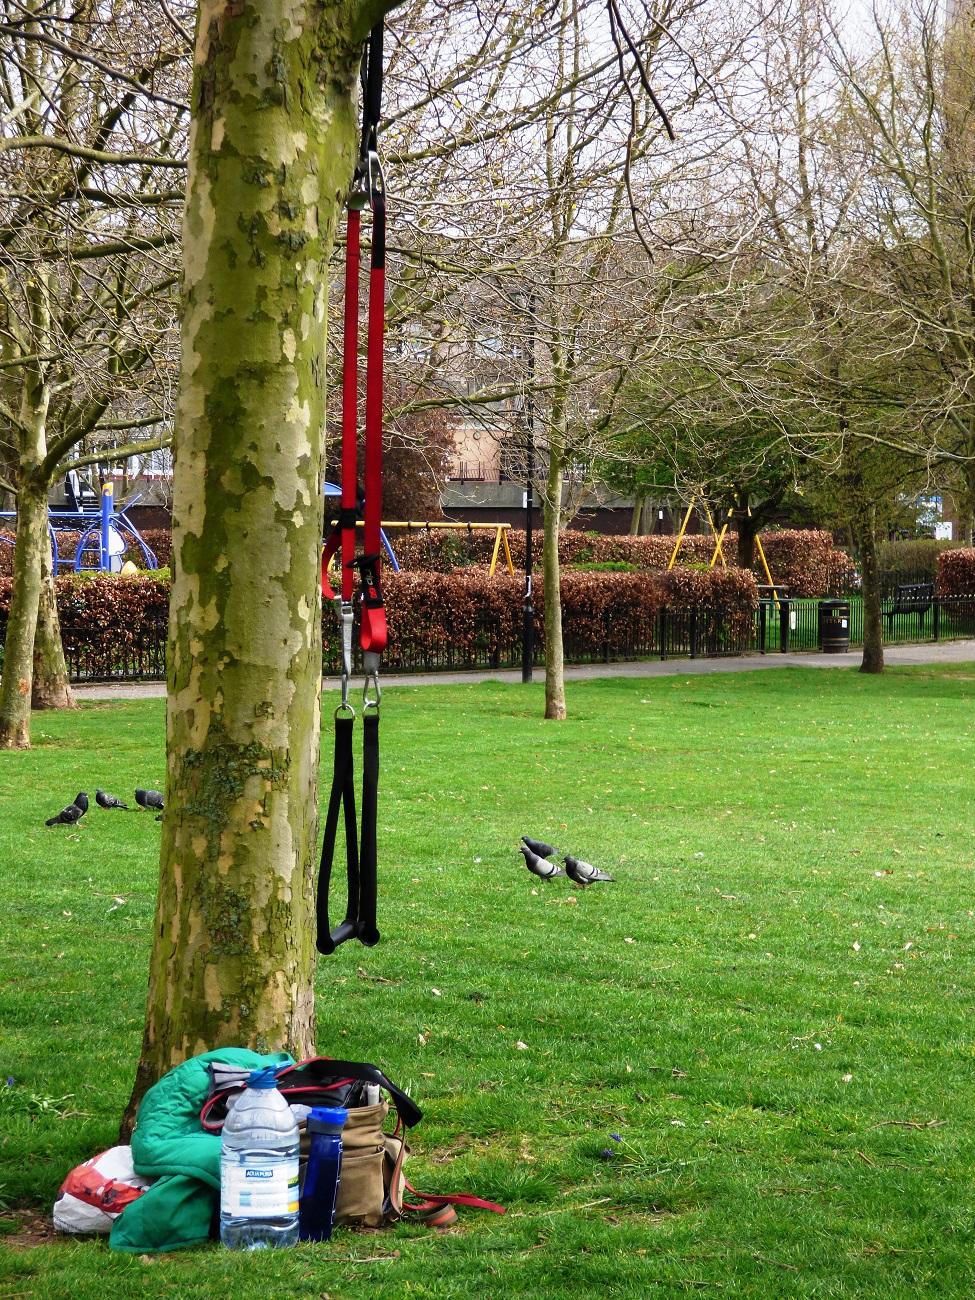 20170328_Tower-Hamlets_Sir-John-McDougall-Gardens_Simply-Hanging